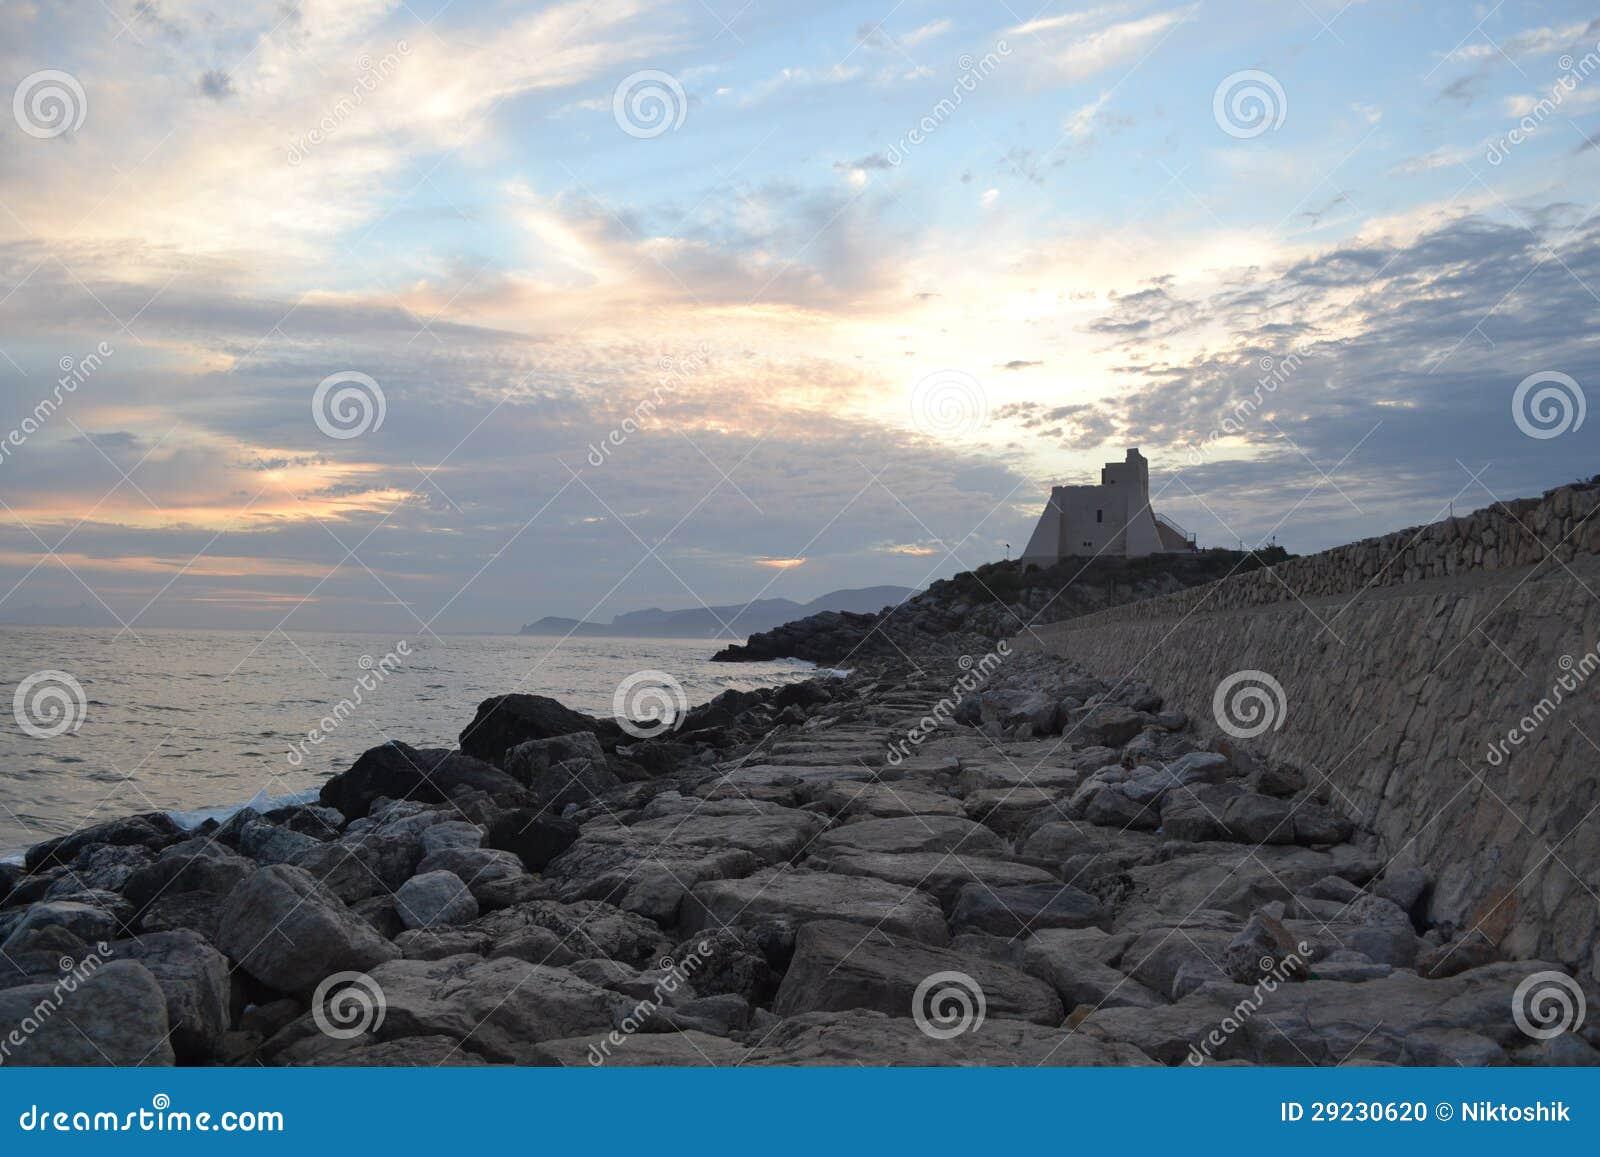 Download Sperlonga_Italy foto de stock. Imagem de seashore, italy - 29230620